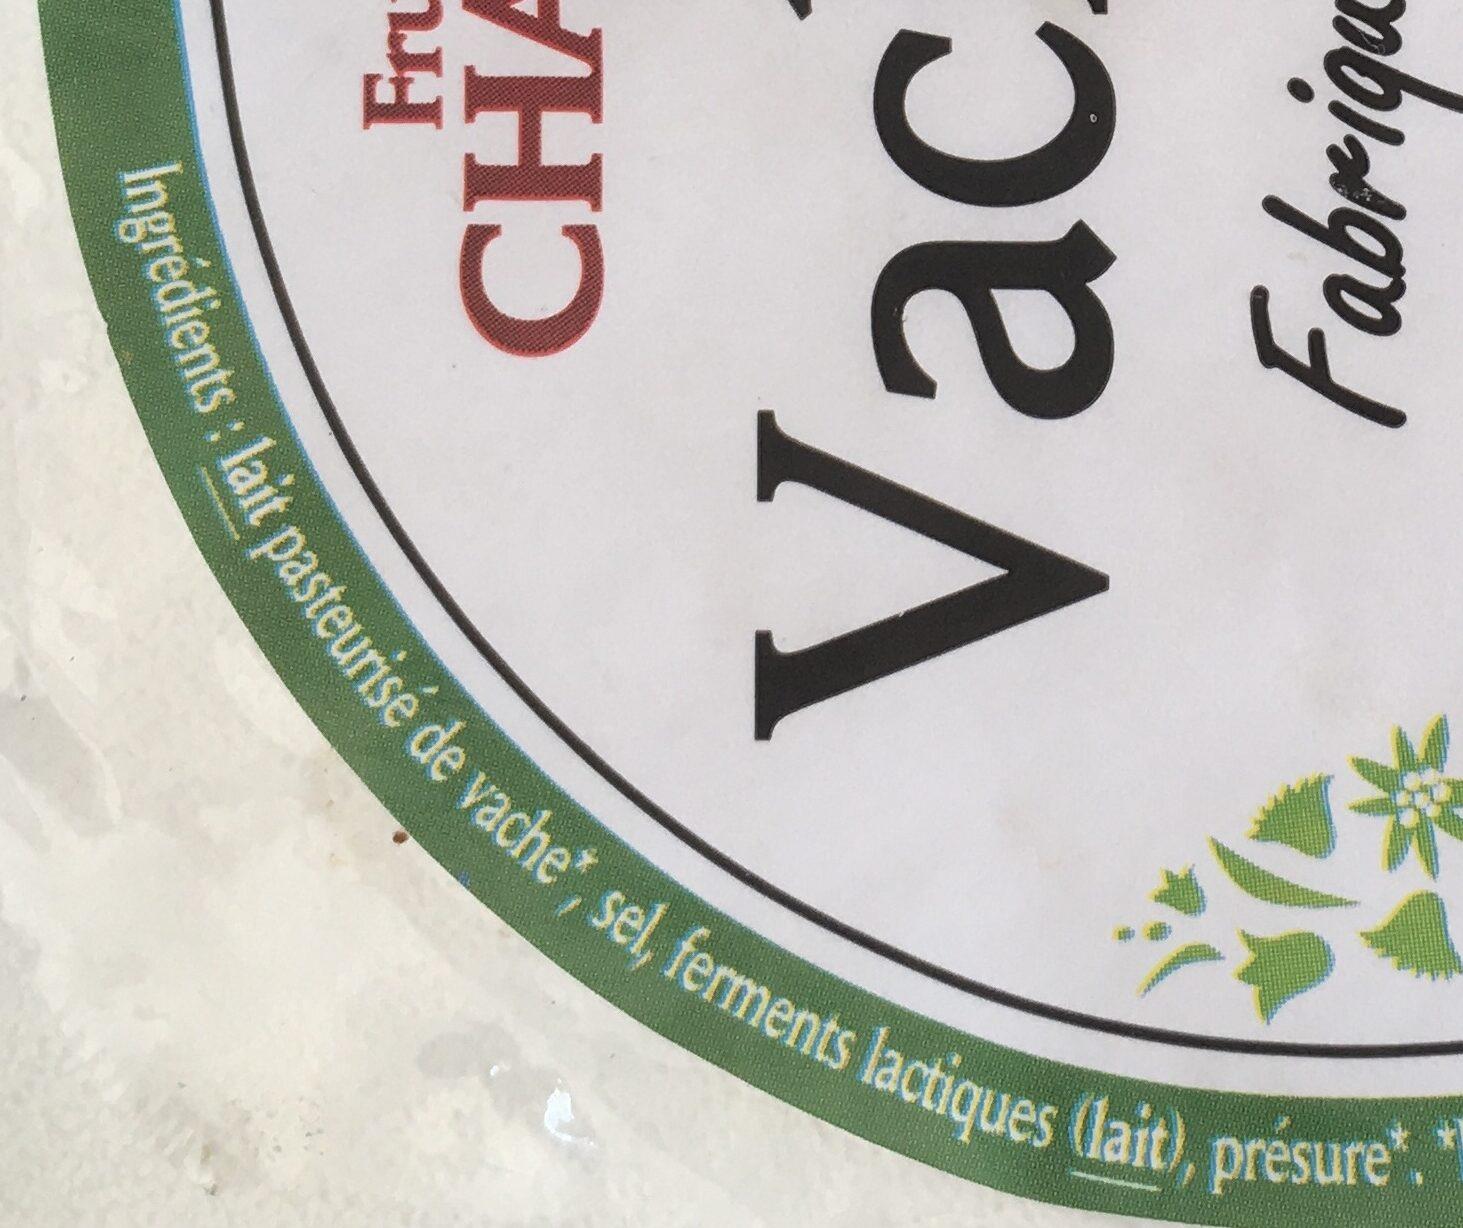 Fromage bio Vacherin Fruitières Chabert - Ingrédients - fr